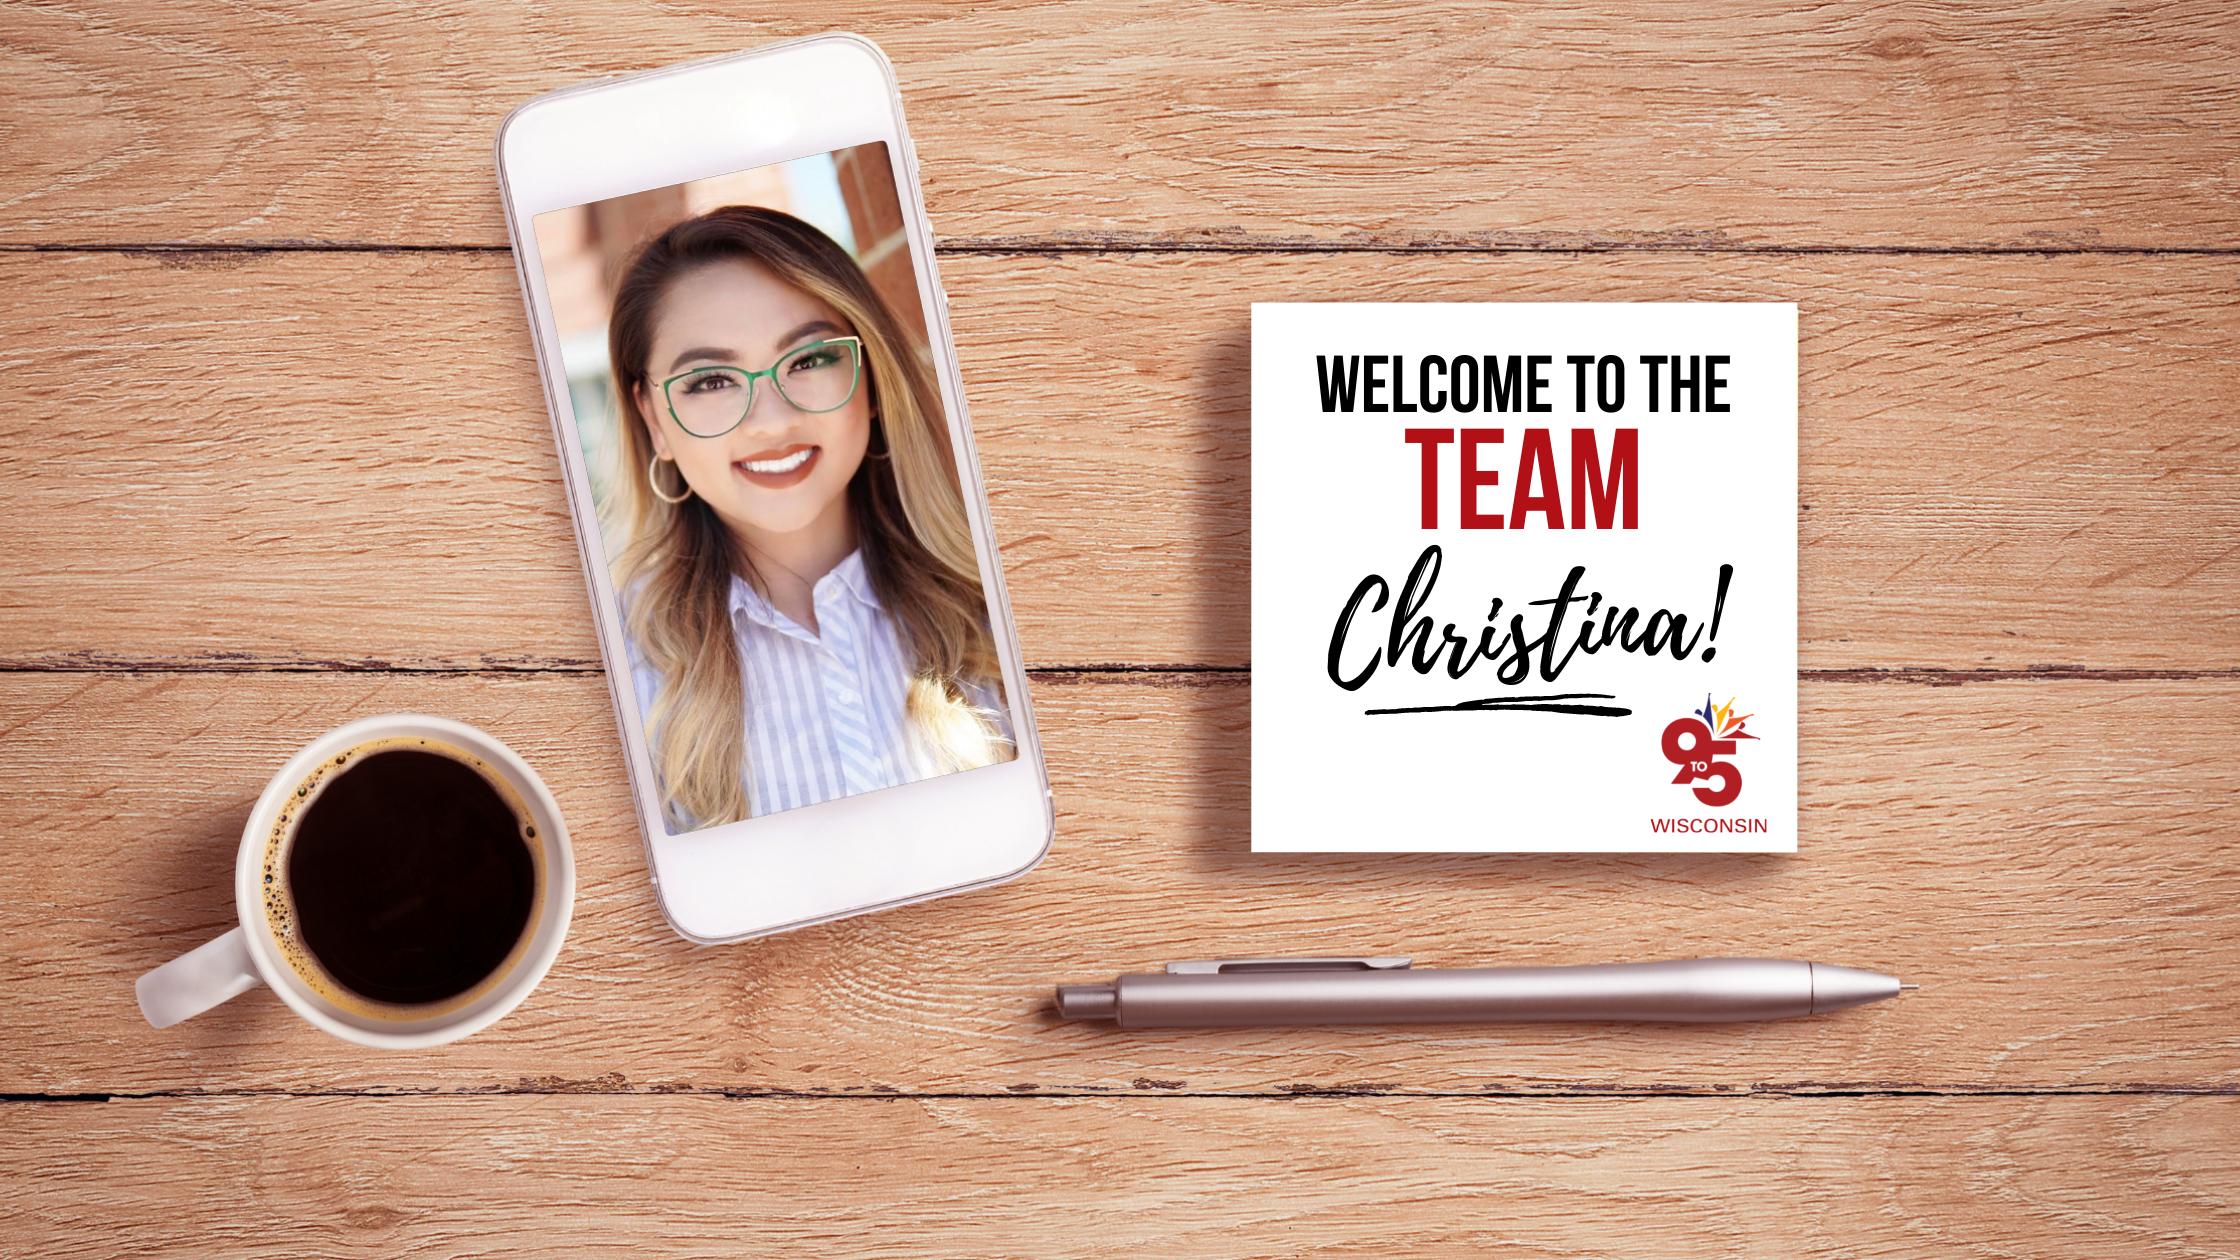 Welcome to the Team, Christina!